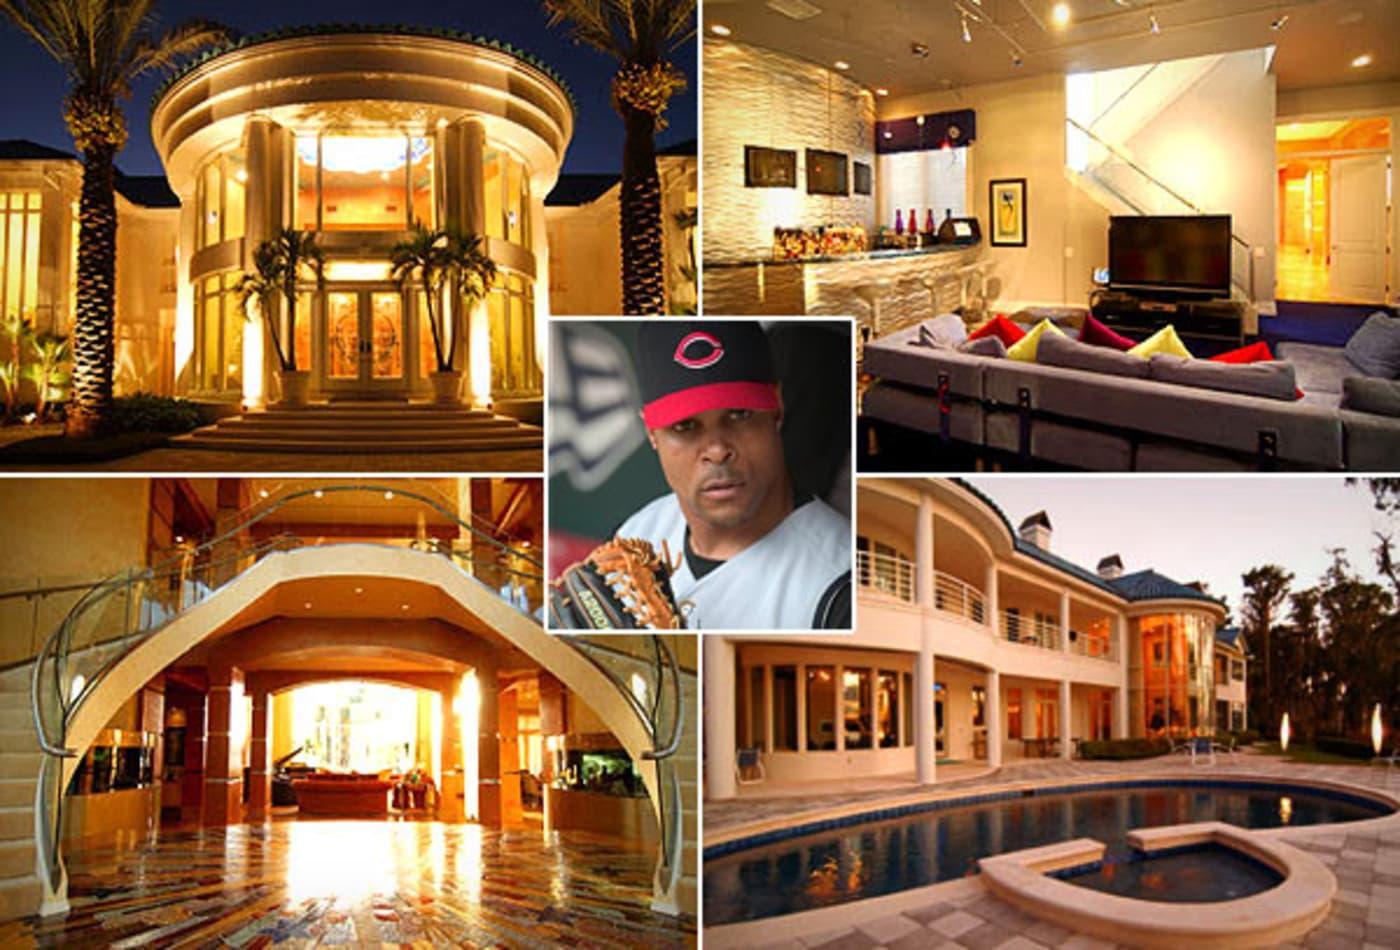 Barry-Larkin-Baseball-Homes-CNBC.jpg